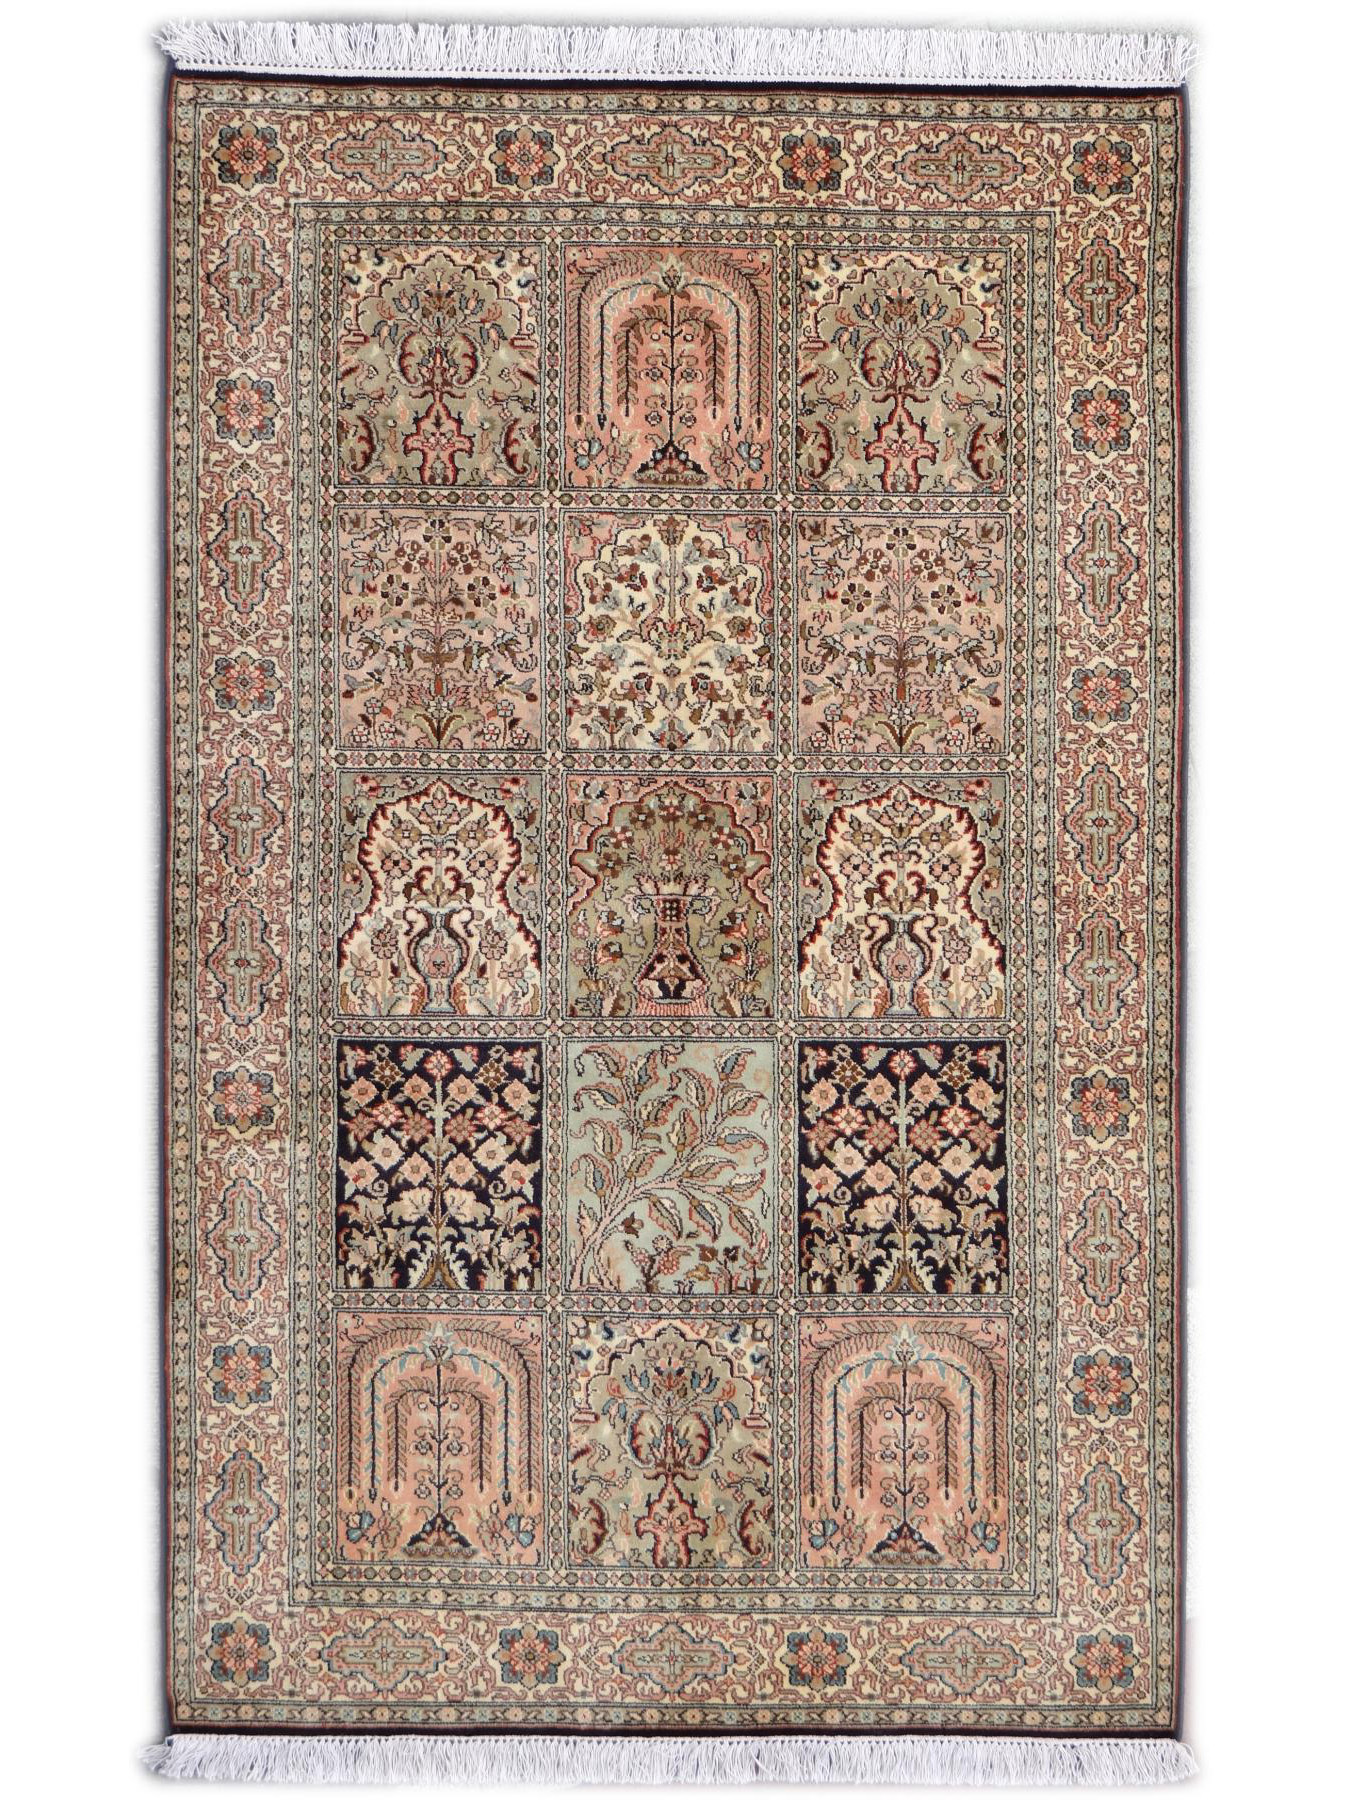 srinagar soie fin jardin tapis prestigieux n 2522 155x96cm. Black Bedroom Furniture Sets. Home Design Ideas